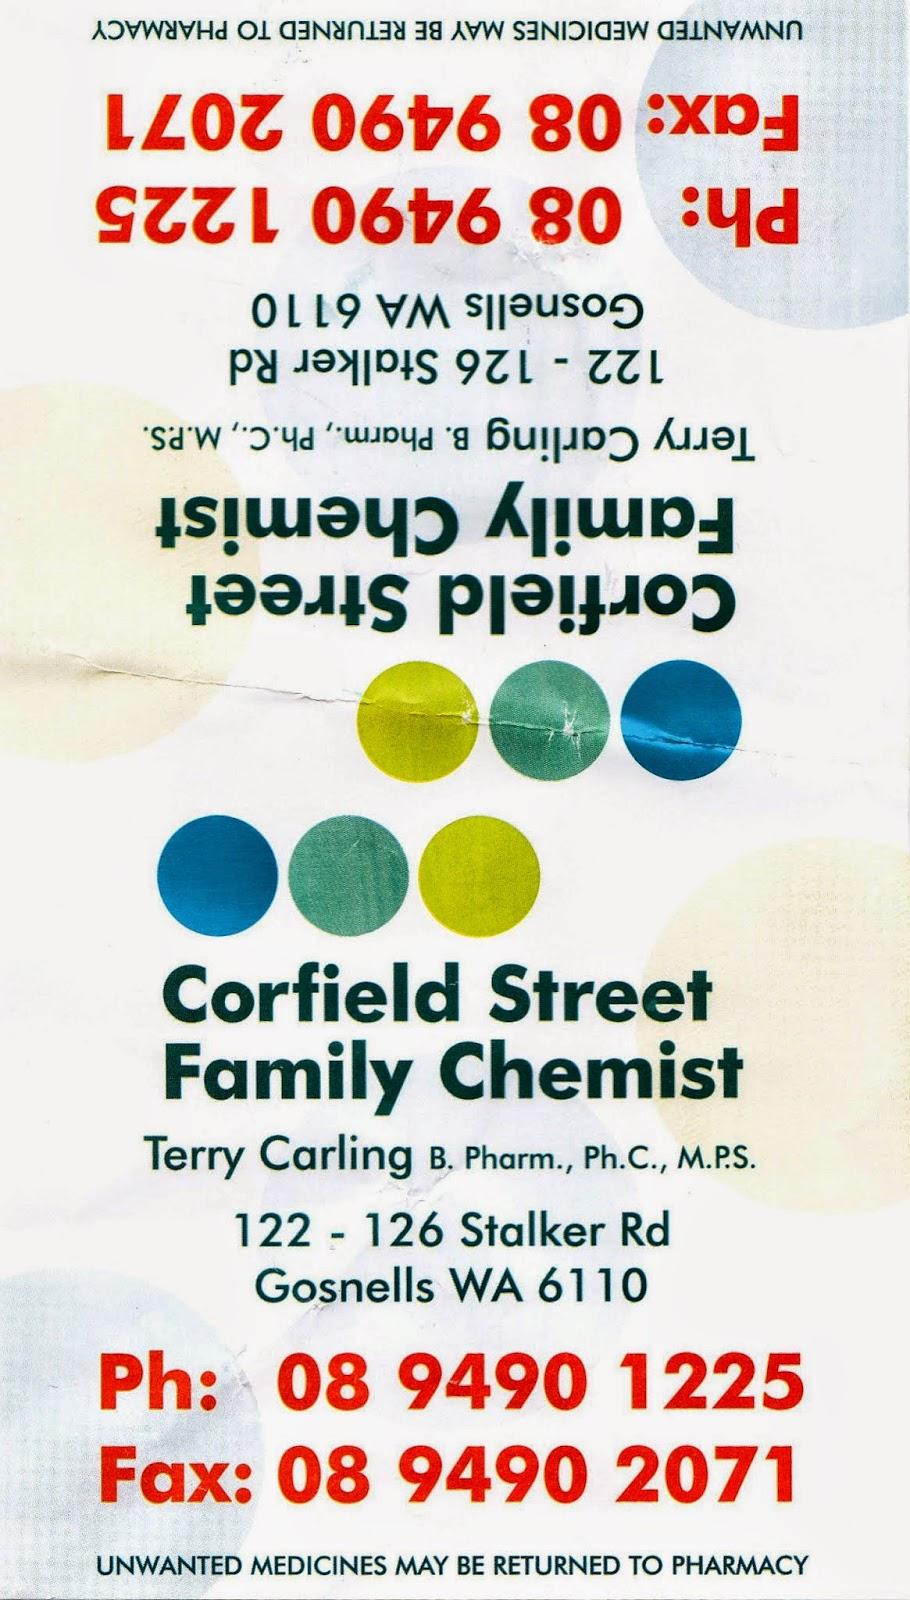 Corfield Street Family Chemist   pharmacy   122-126 Stalker Rd, Gosnells WA 6110, Australia   0894901225 OR +61 8 9490 1225